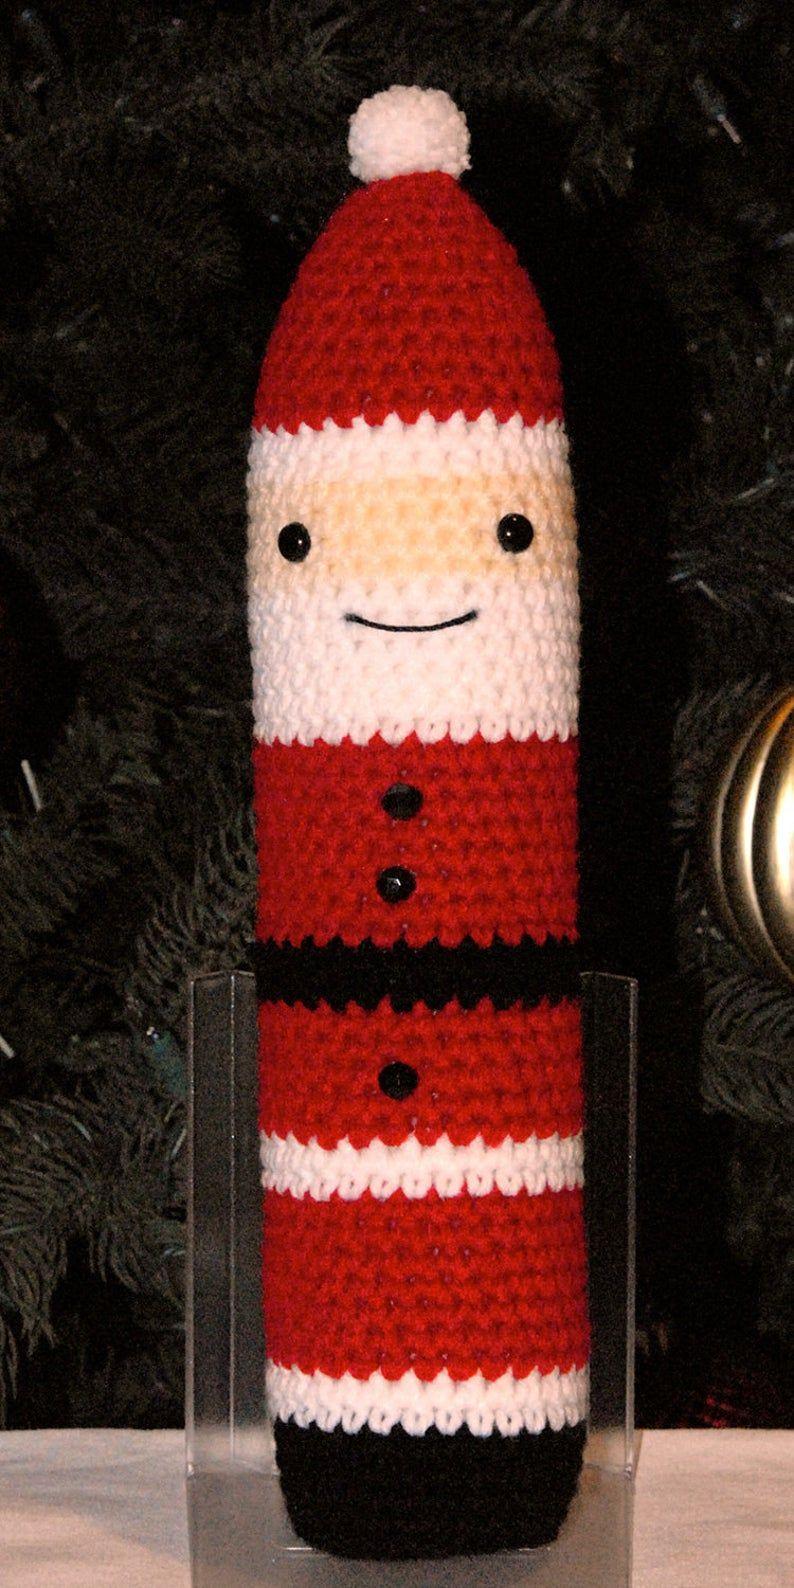 Crochet Patterns Amigurumi Christmas Santa Mrs Claus And Etsy In 2020 Christmas Crochet Crochet Patterns Crochet Patterns Amigurumi